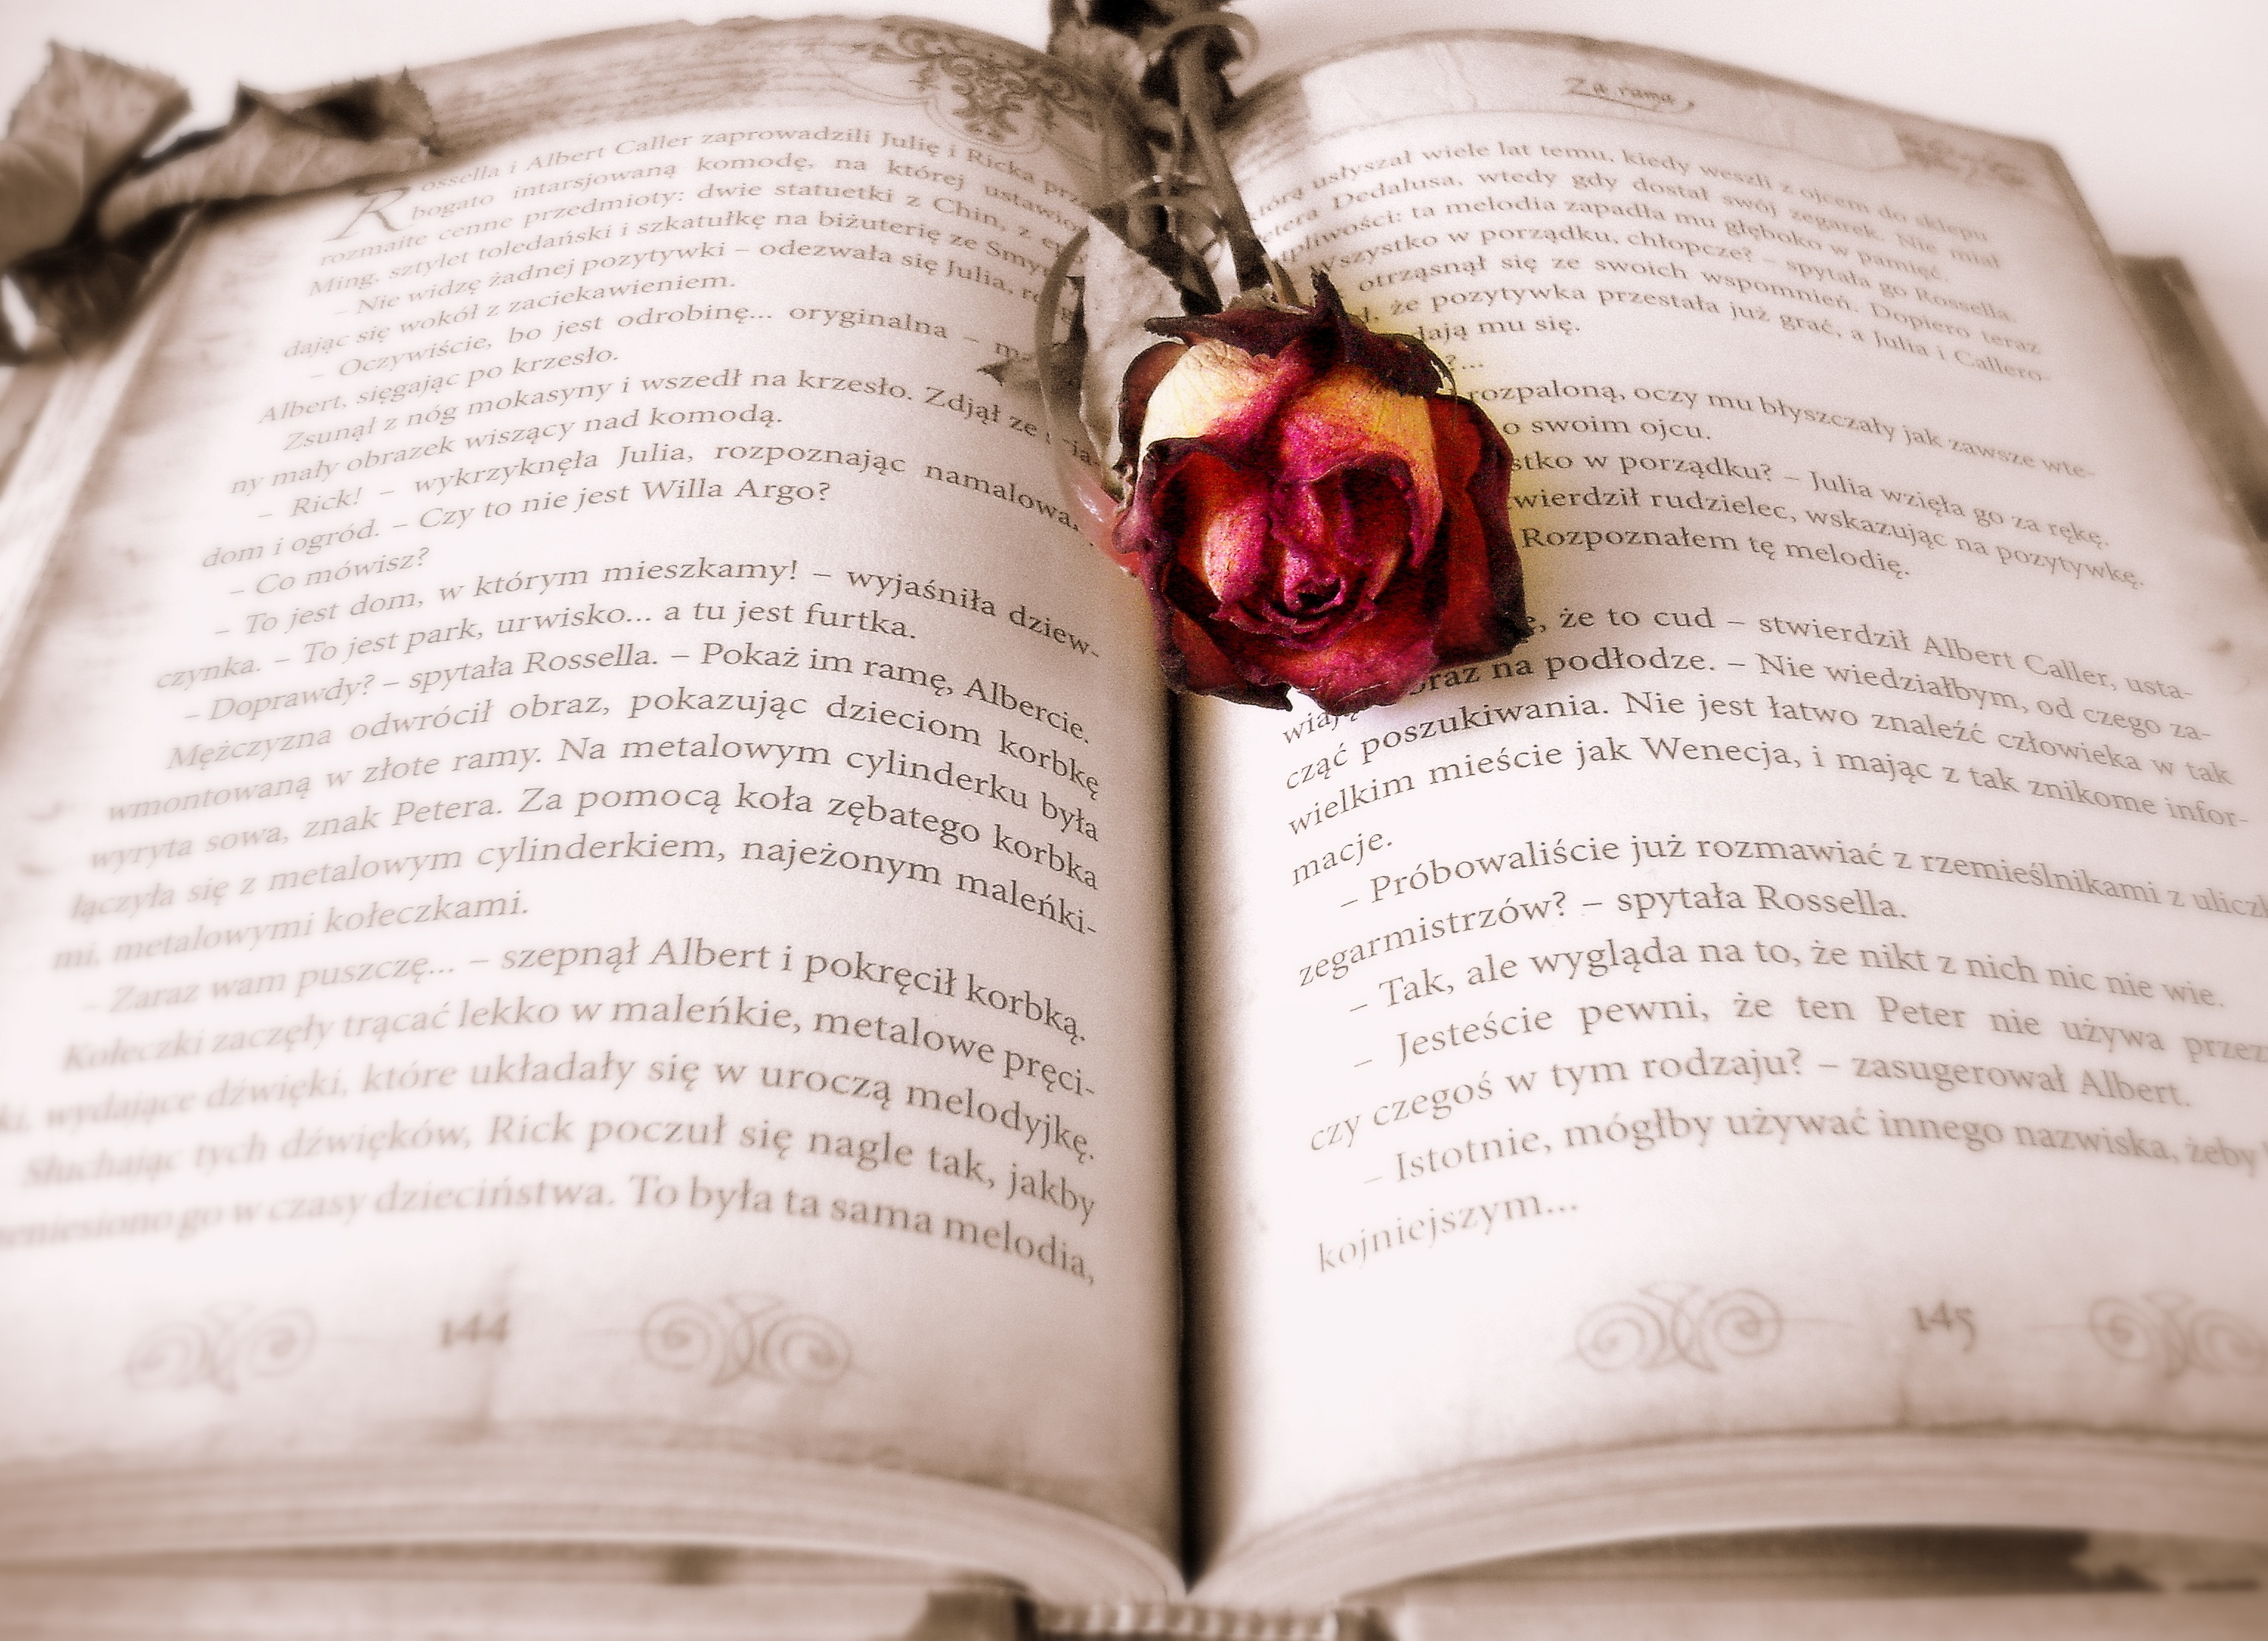 writing-book-novel-reading-rose-romantic-944135-pxhere.com